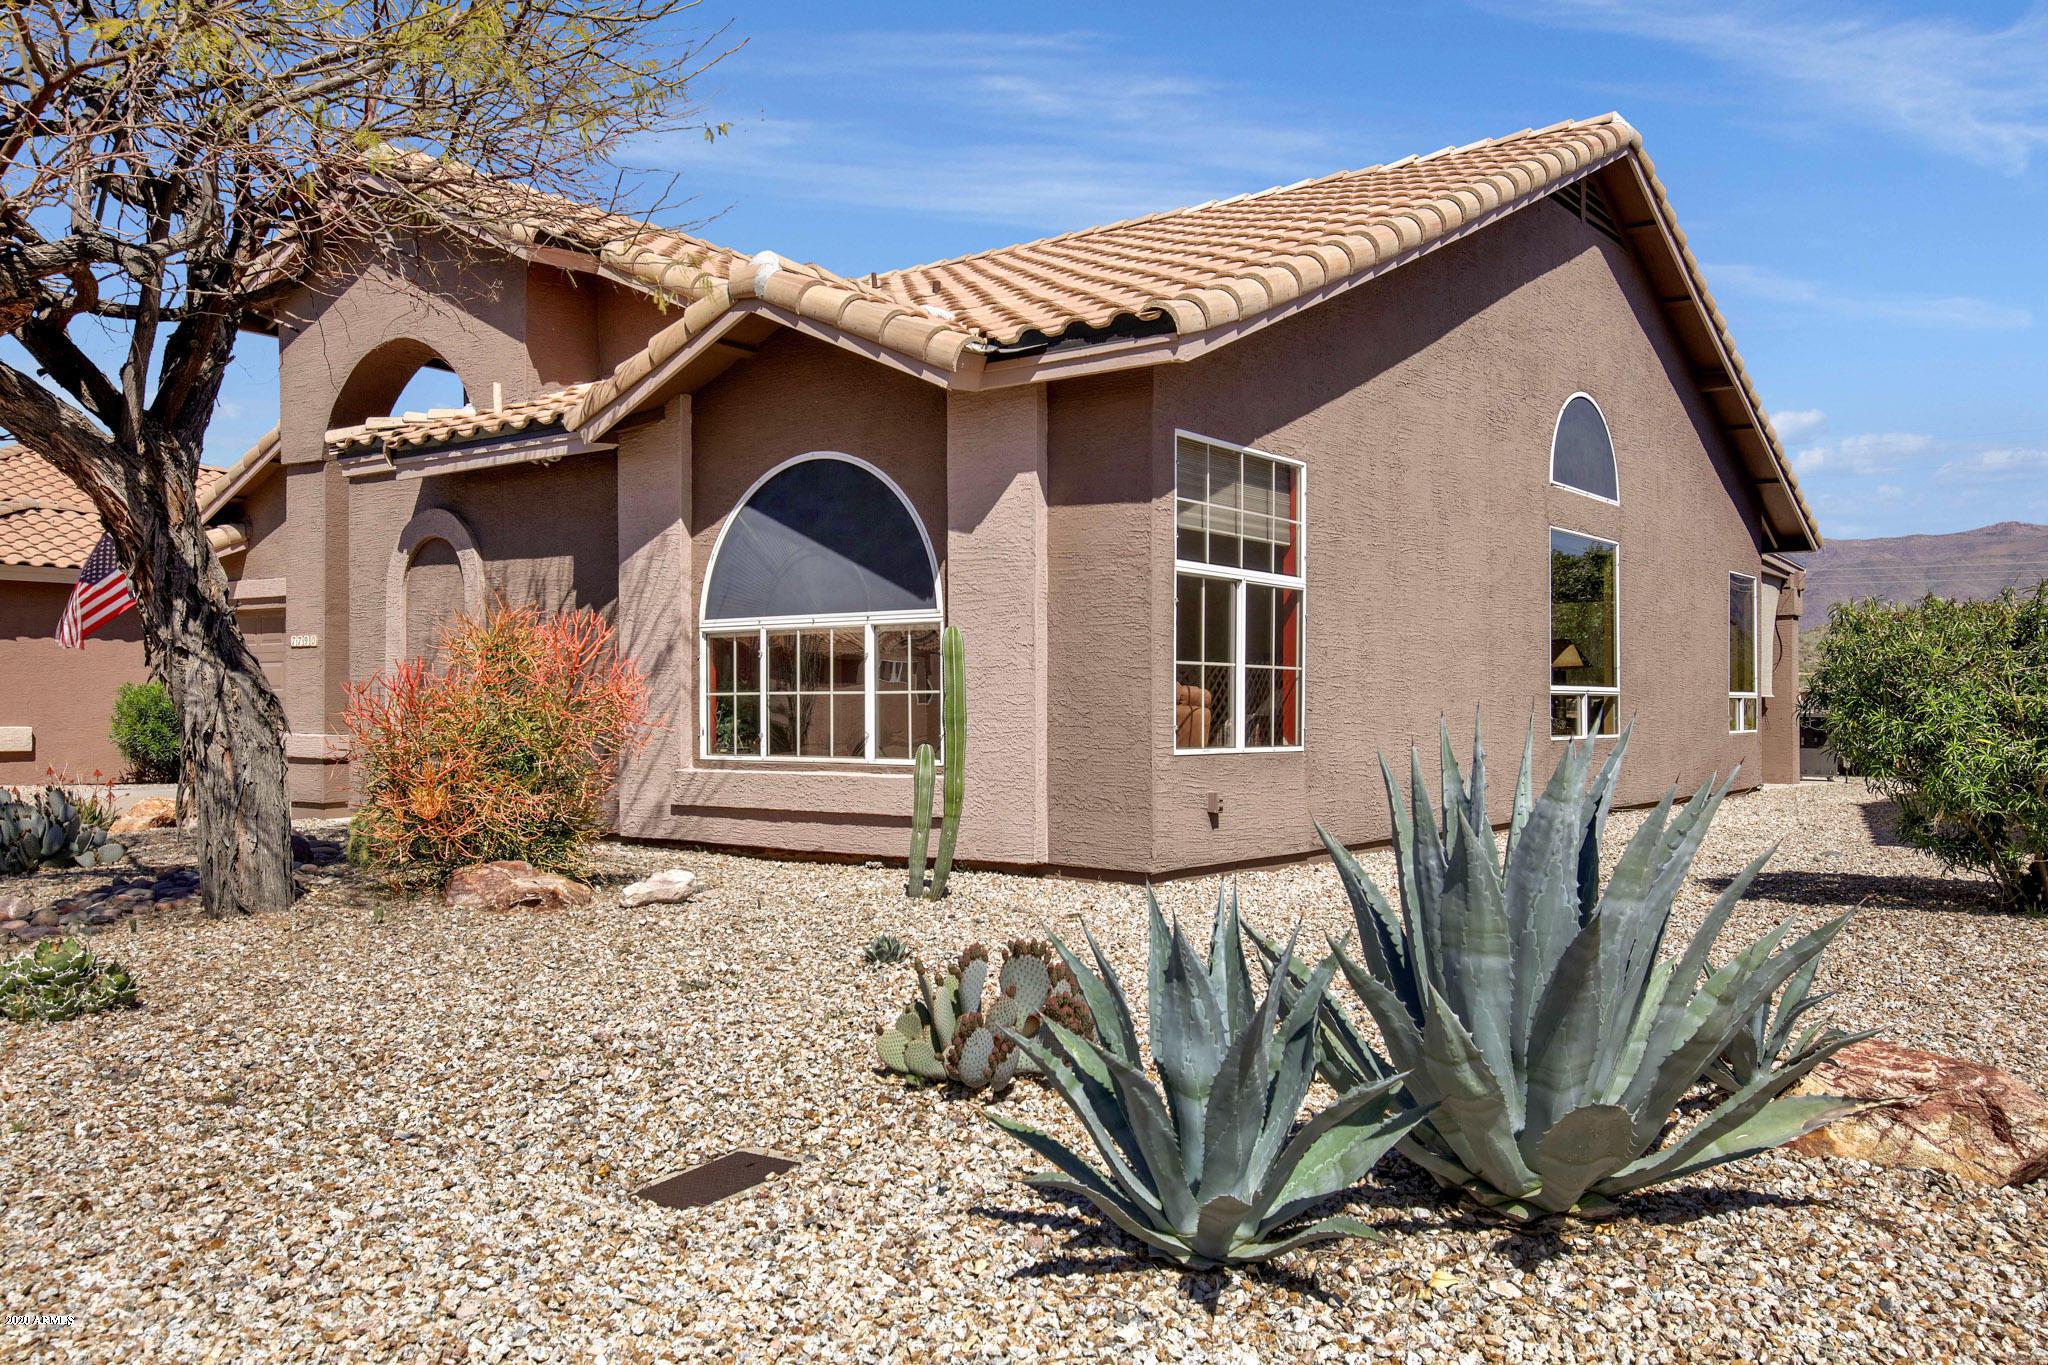 7790 E WHISPERING MESQUITE Lane, Gold Canyon, Arizona 85118, 2 Bedrooms Bedrooms, ,Residential,For Sale,7790 E WHISPERING MESQUITE Lane,6048489